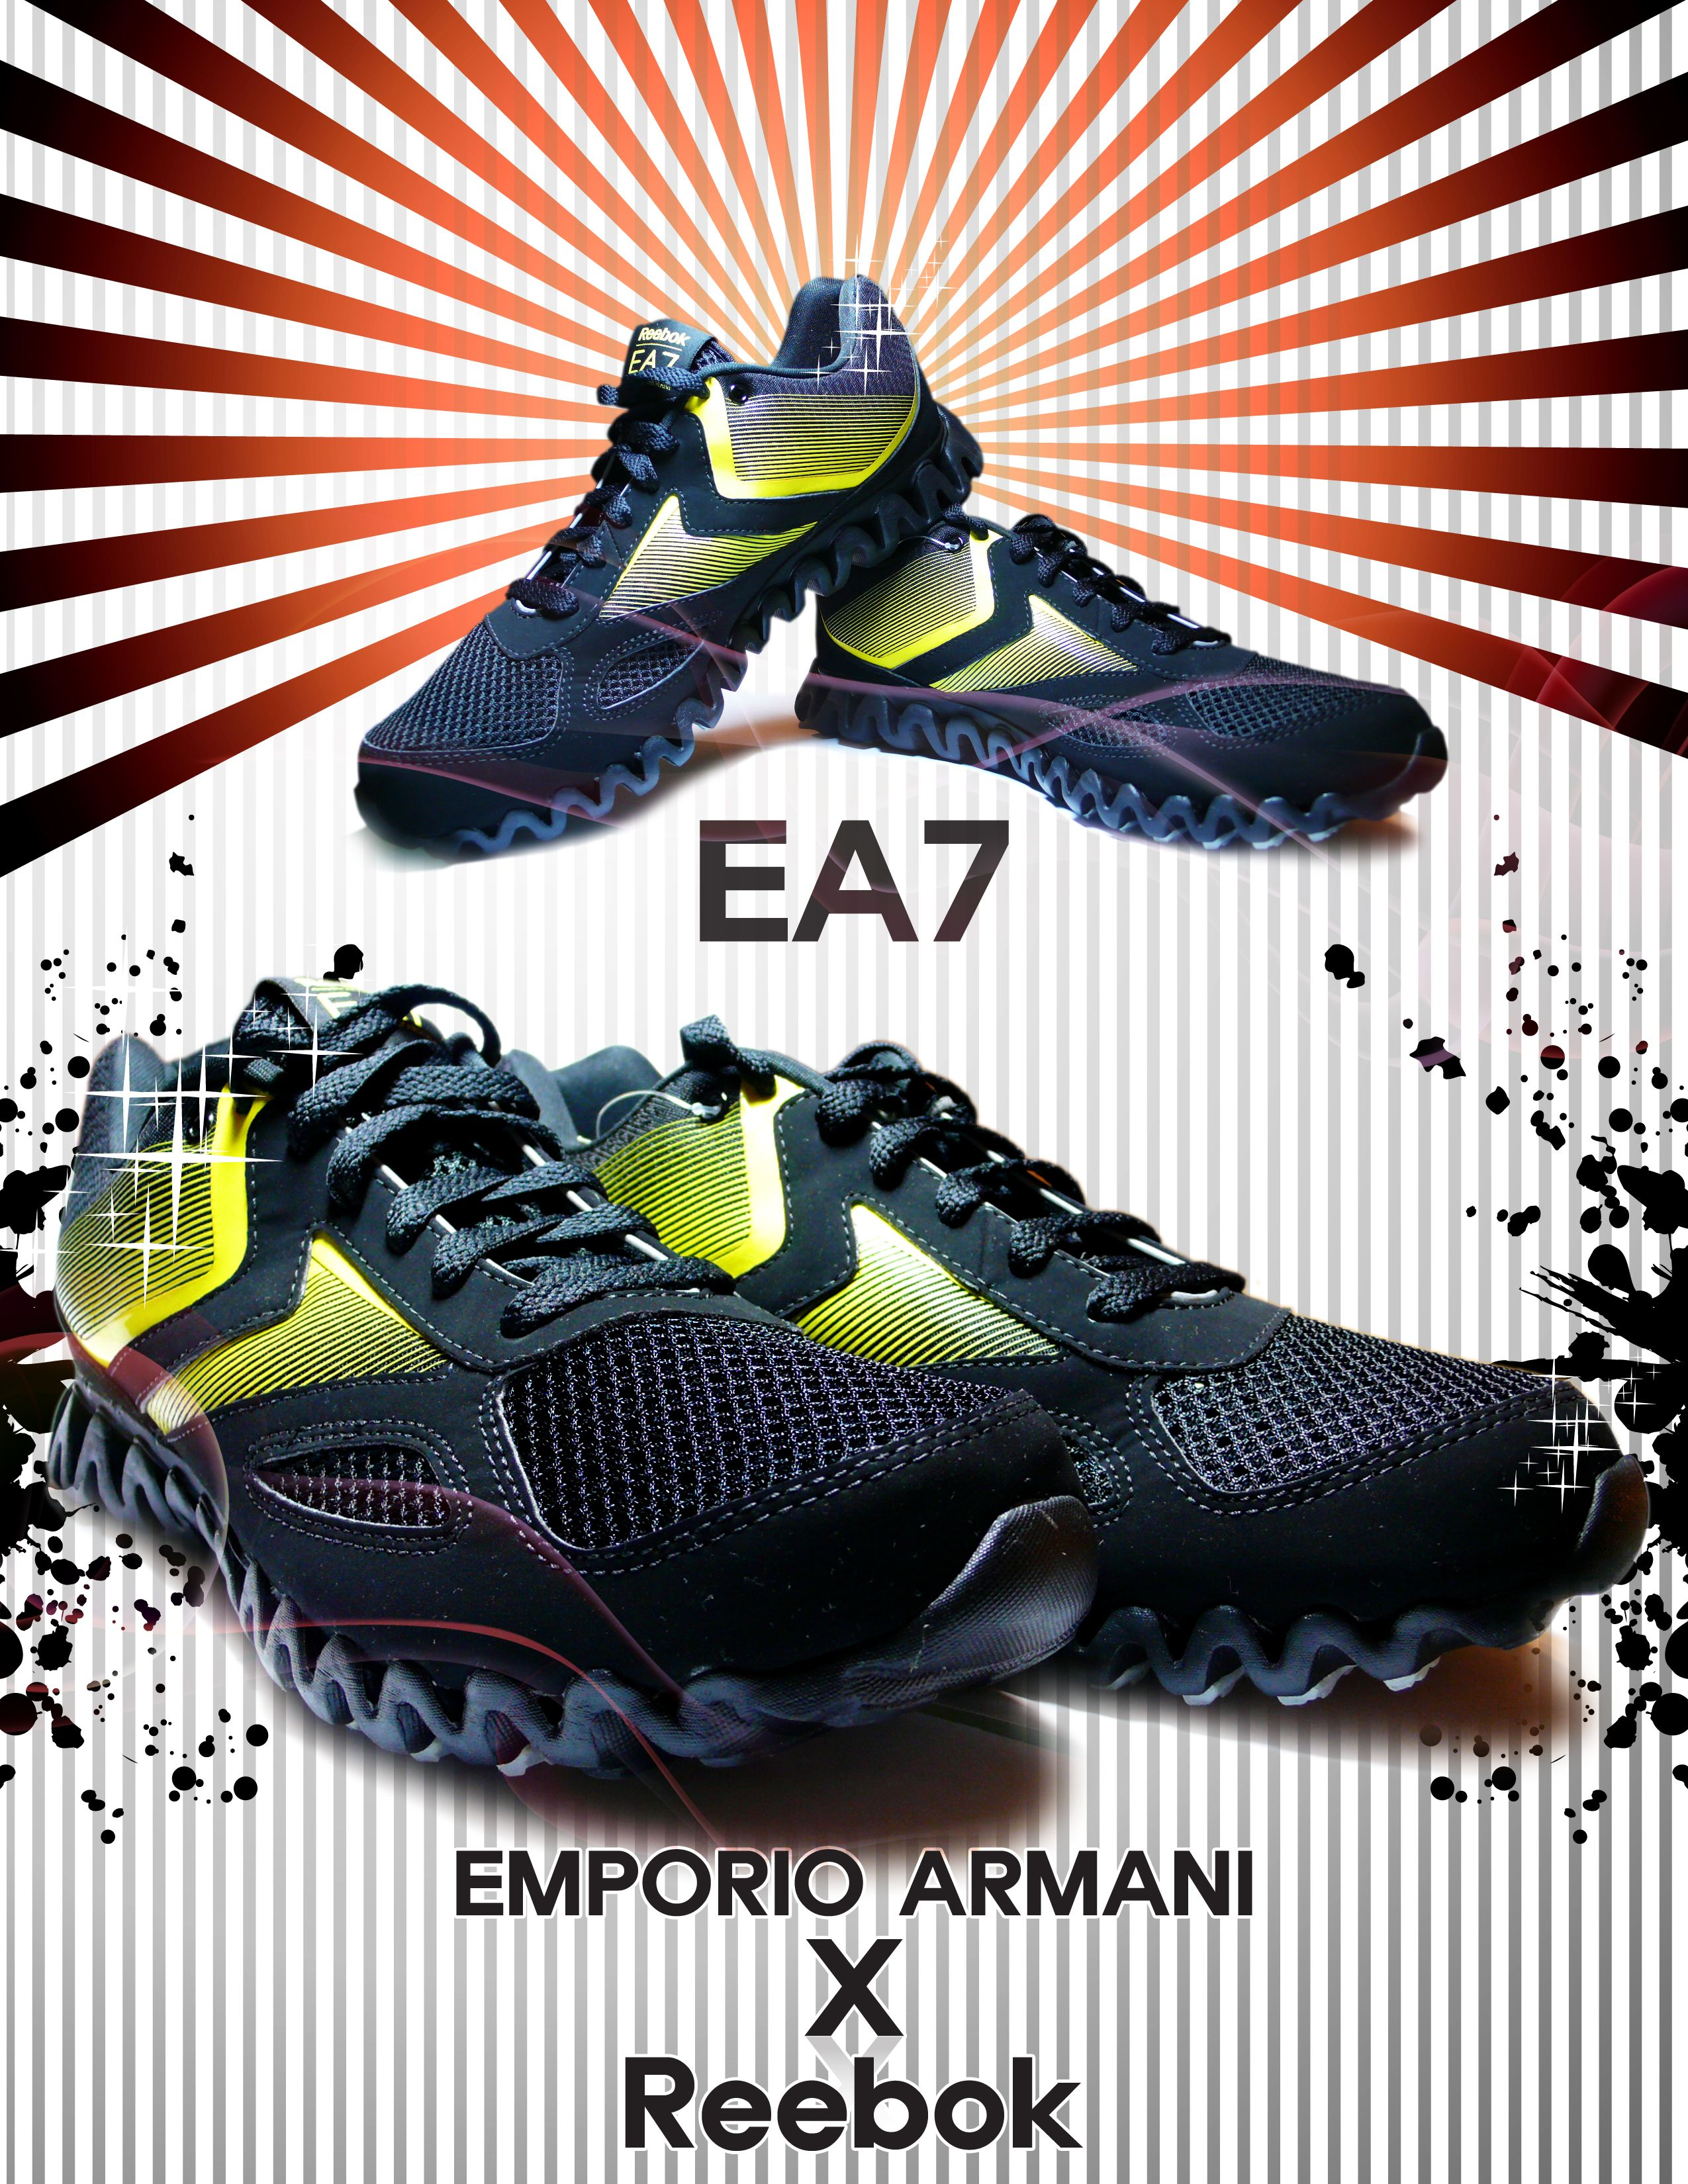 Emporio Armani X Reebok Zig Racer + EA7 Runner   Shoe collections ... b9238f36a186